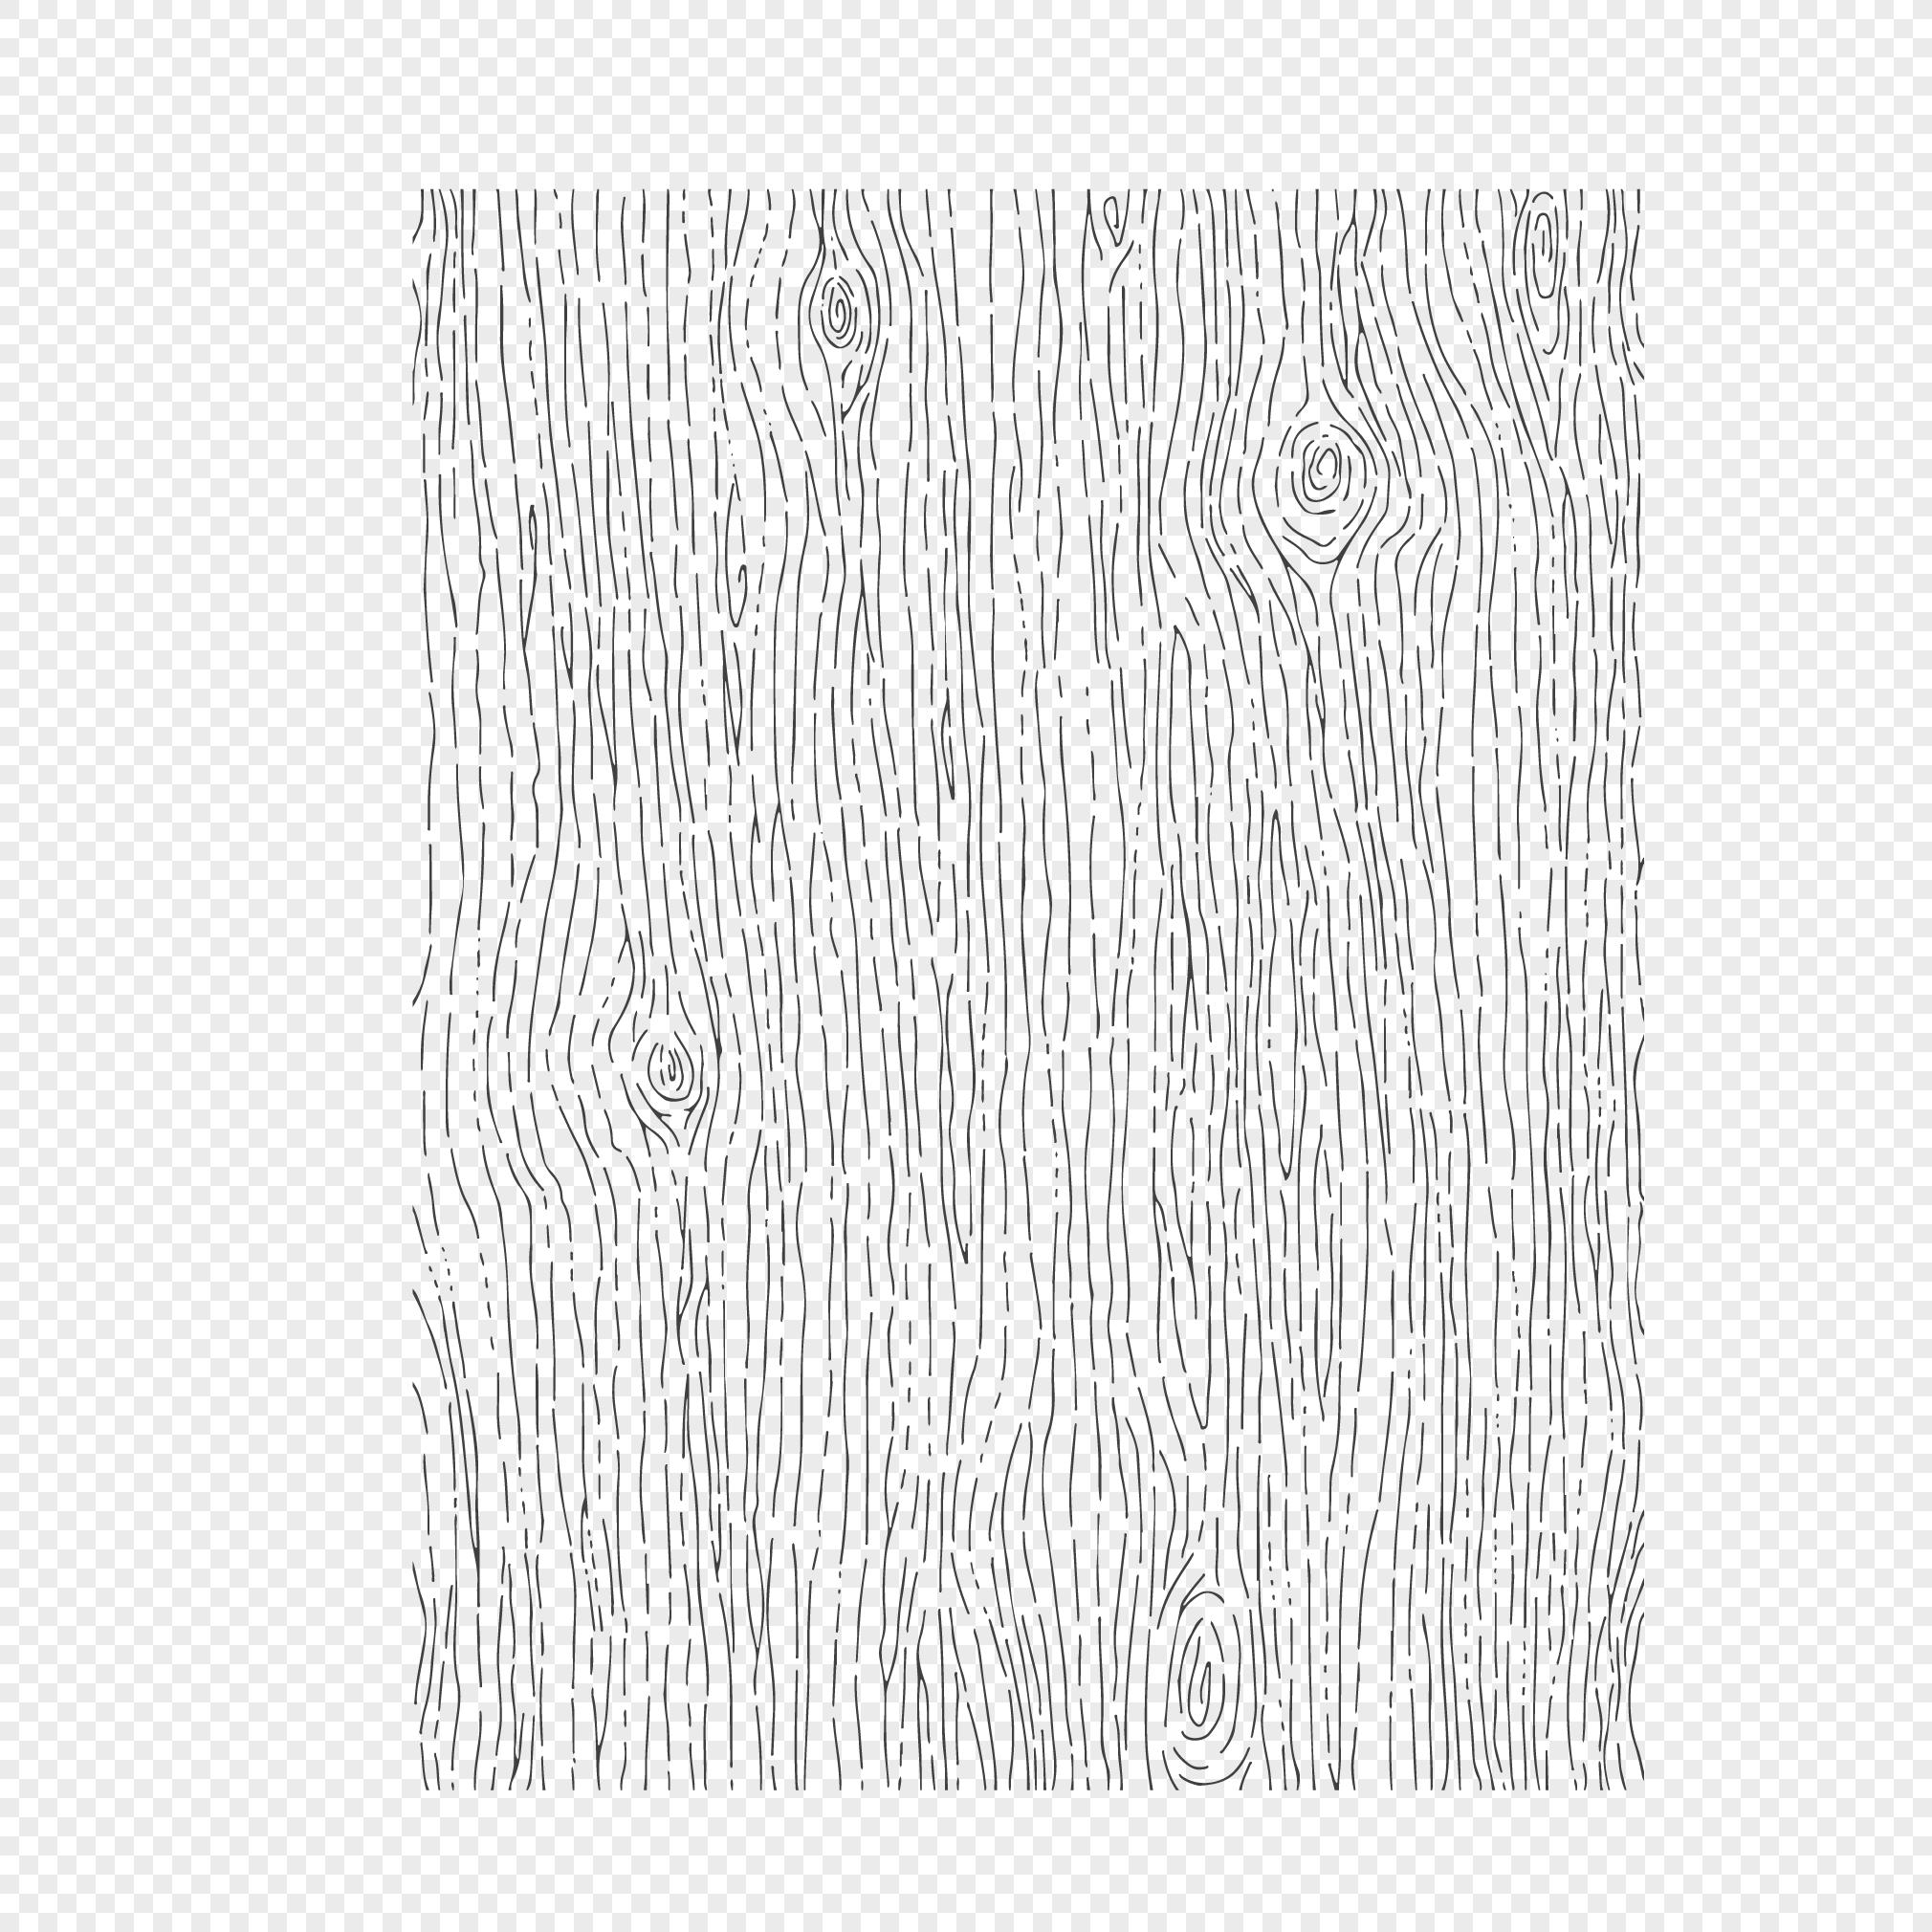 Pencil Draw Wood Grain Www Picturesboss Com